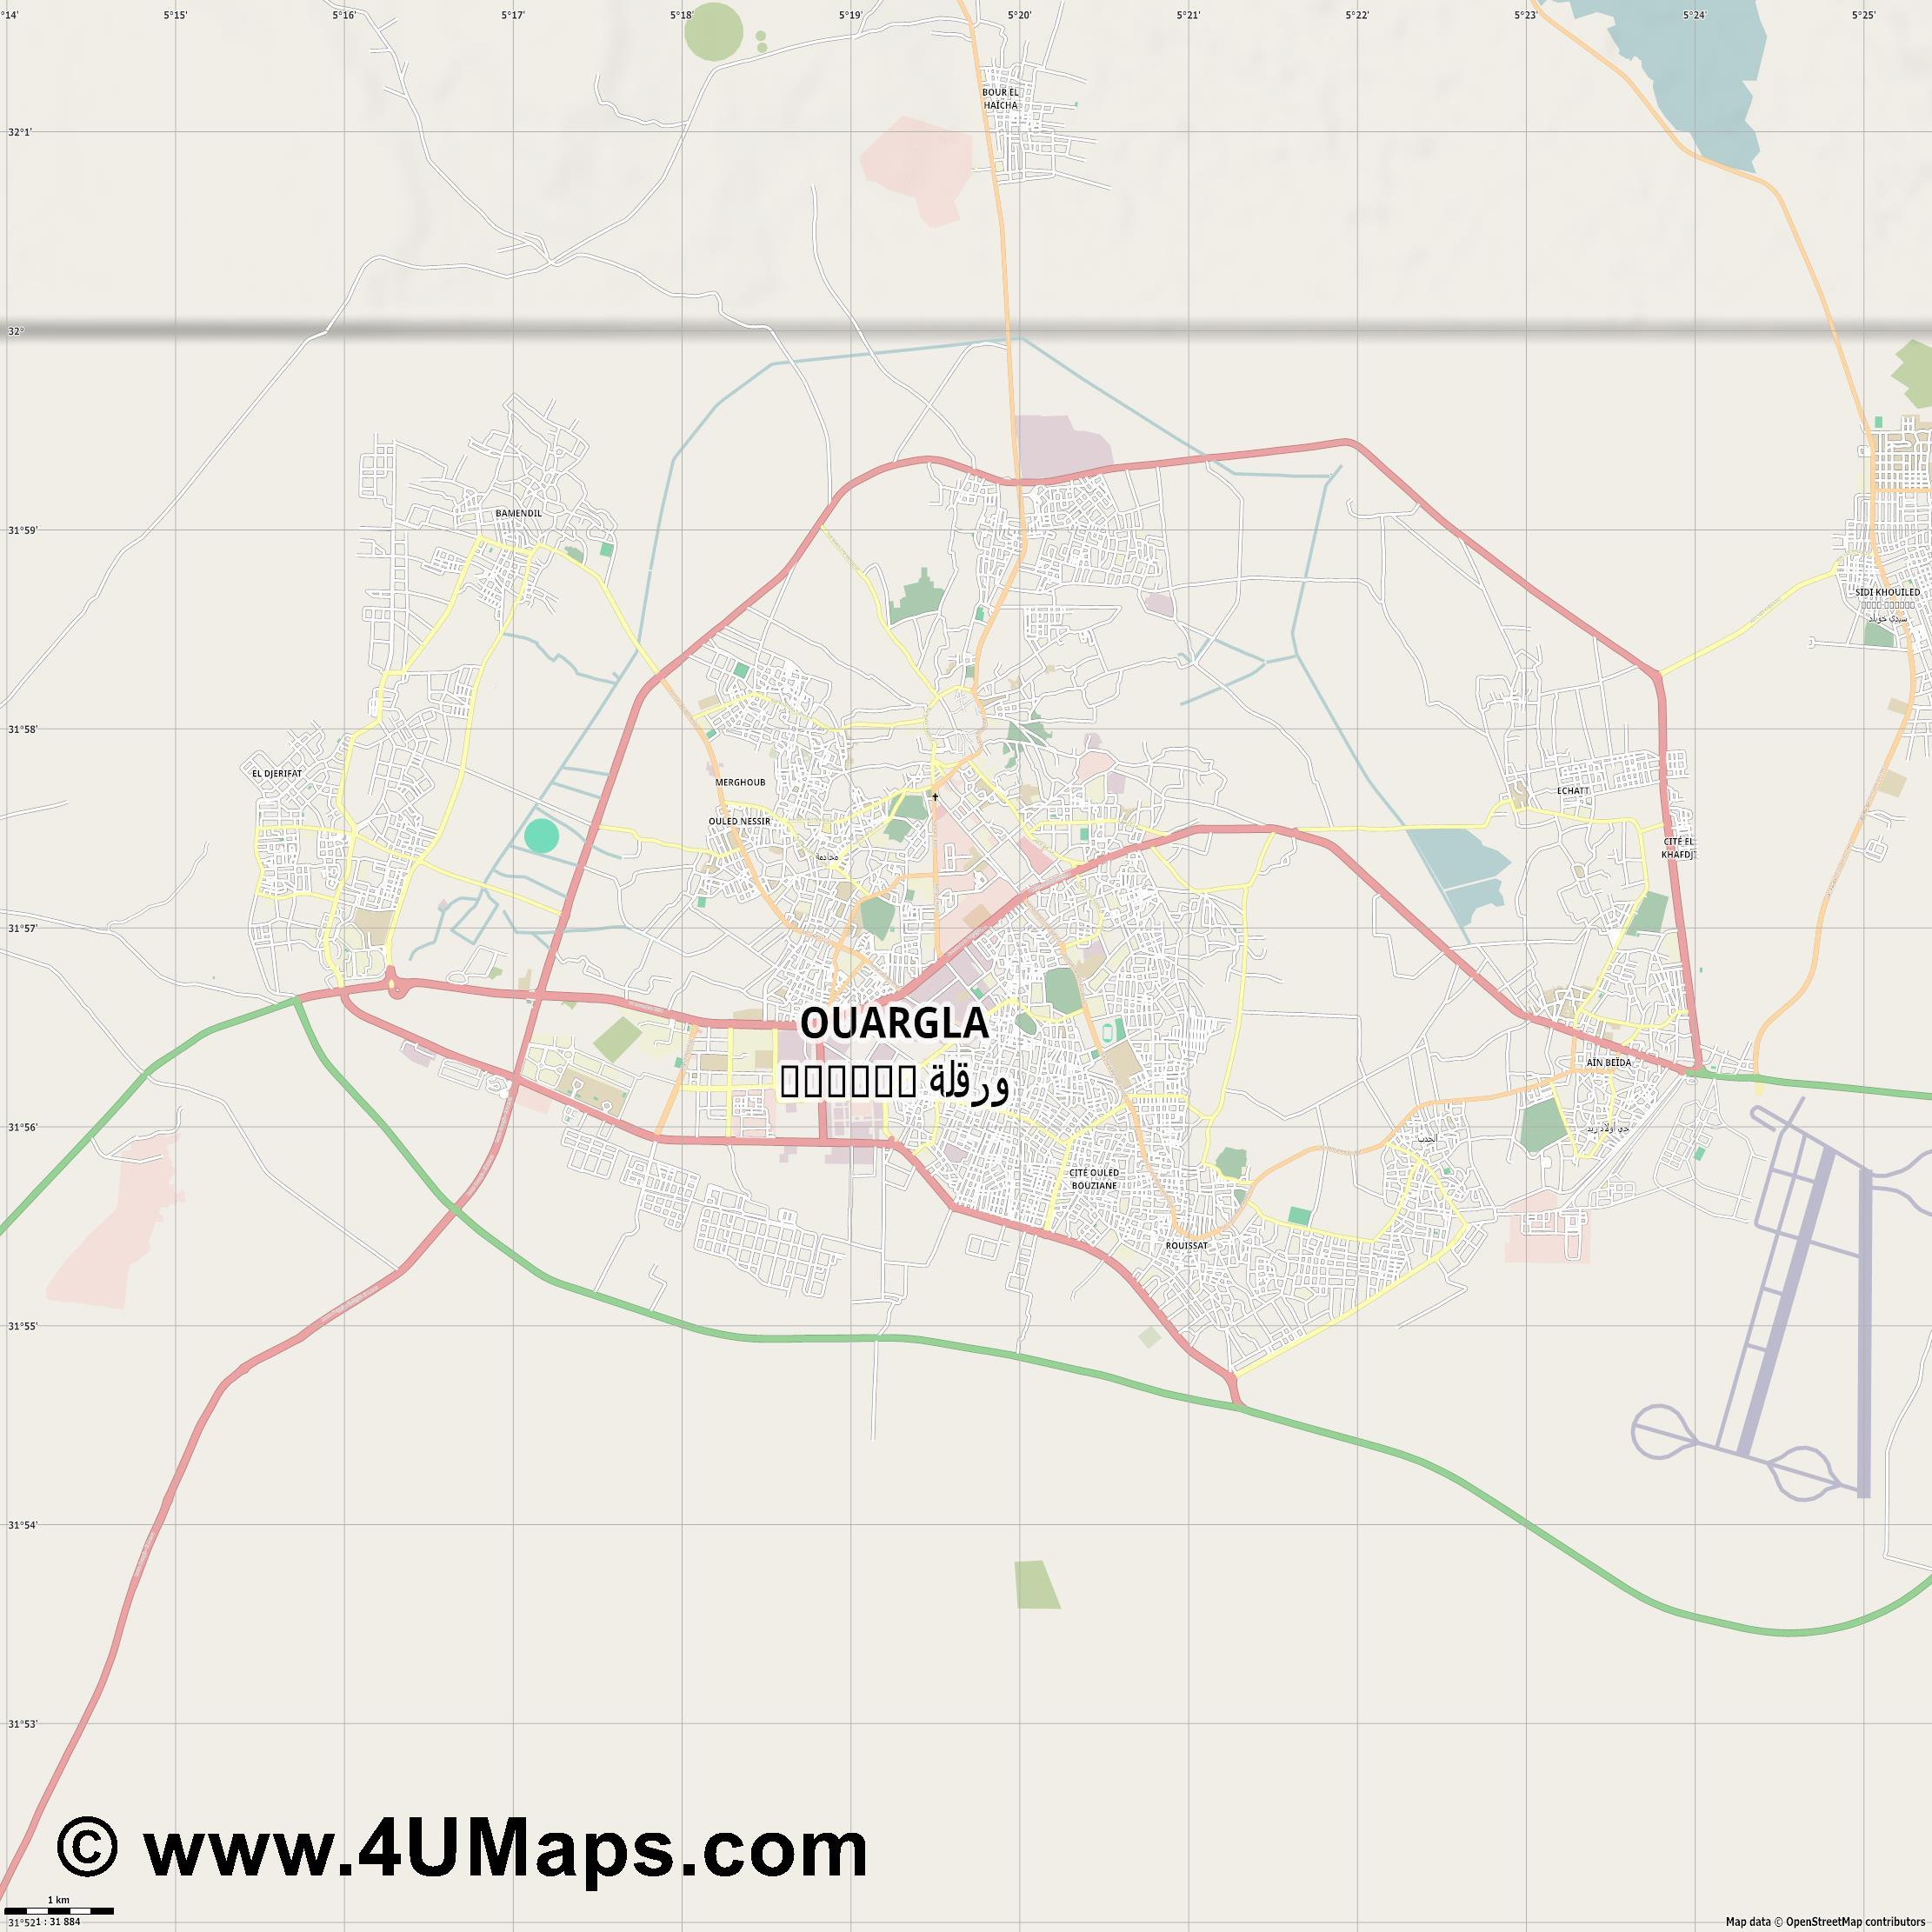 Svg Scalable Vector City Map Ouargla و رڤلة - Ouargla map